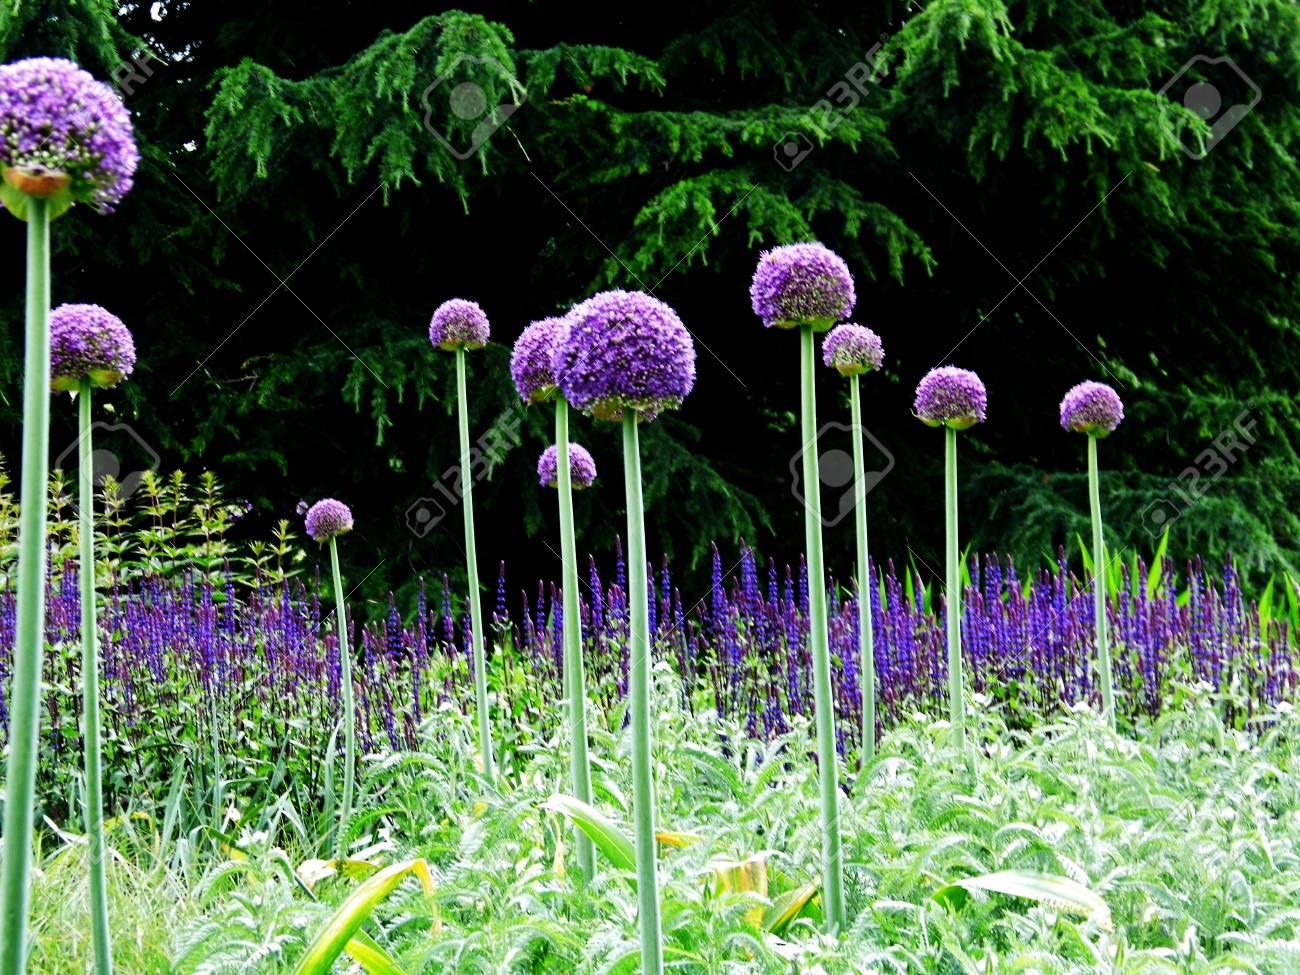 Many Purple Allium Flowers In An Ornamental Garden Border. Stock Photo    92526823